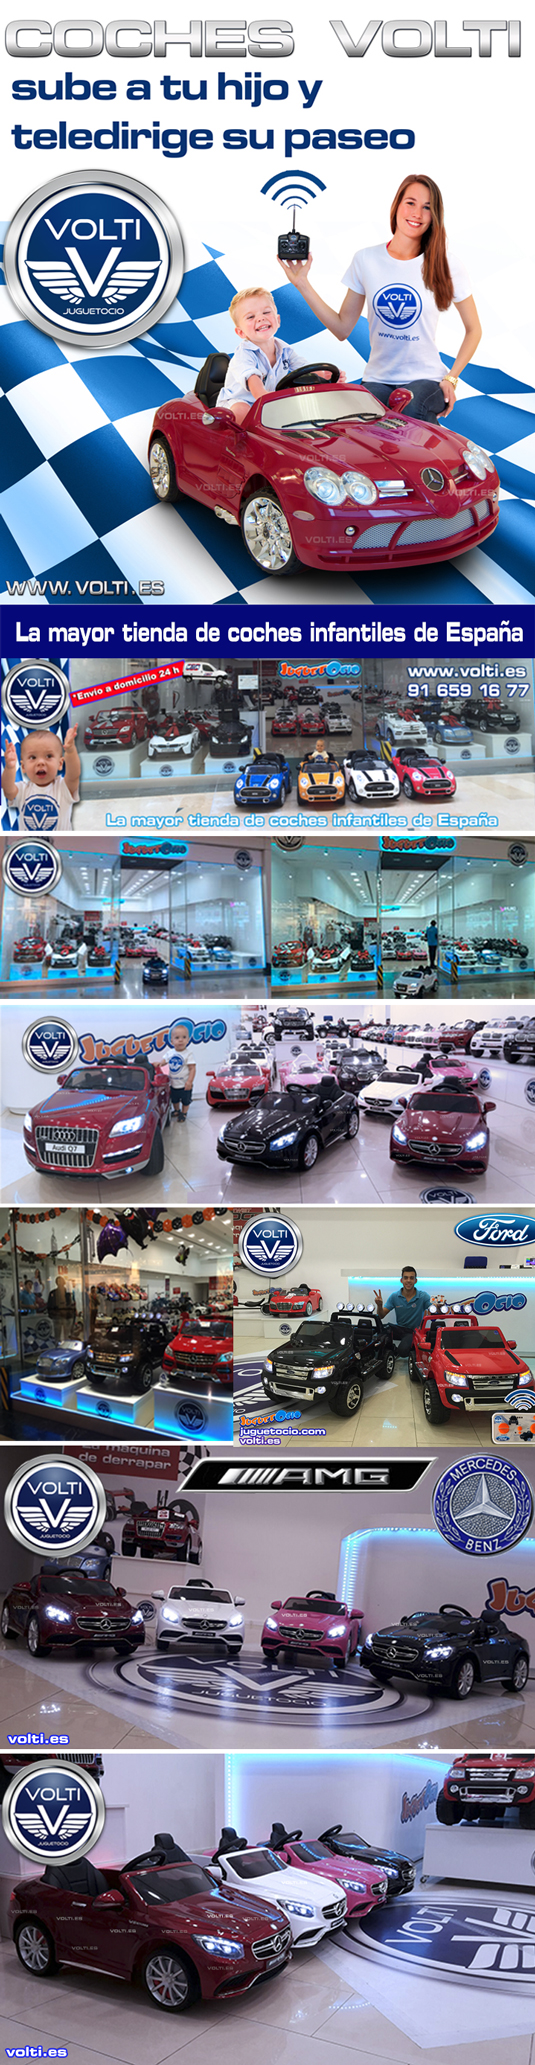 coches-electricos-infantiles-jugueteria-coches-electricos-volti